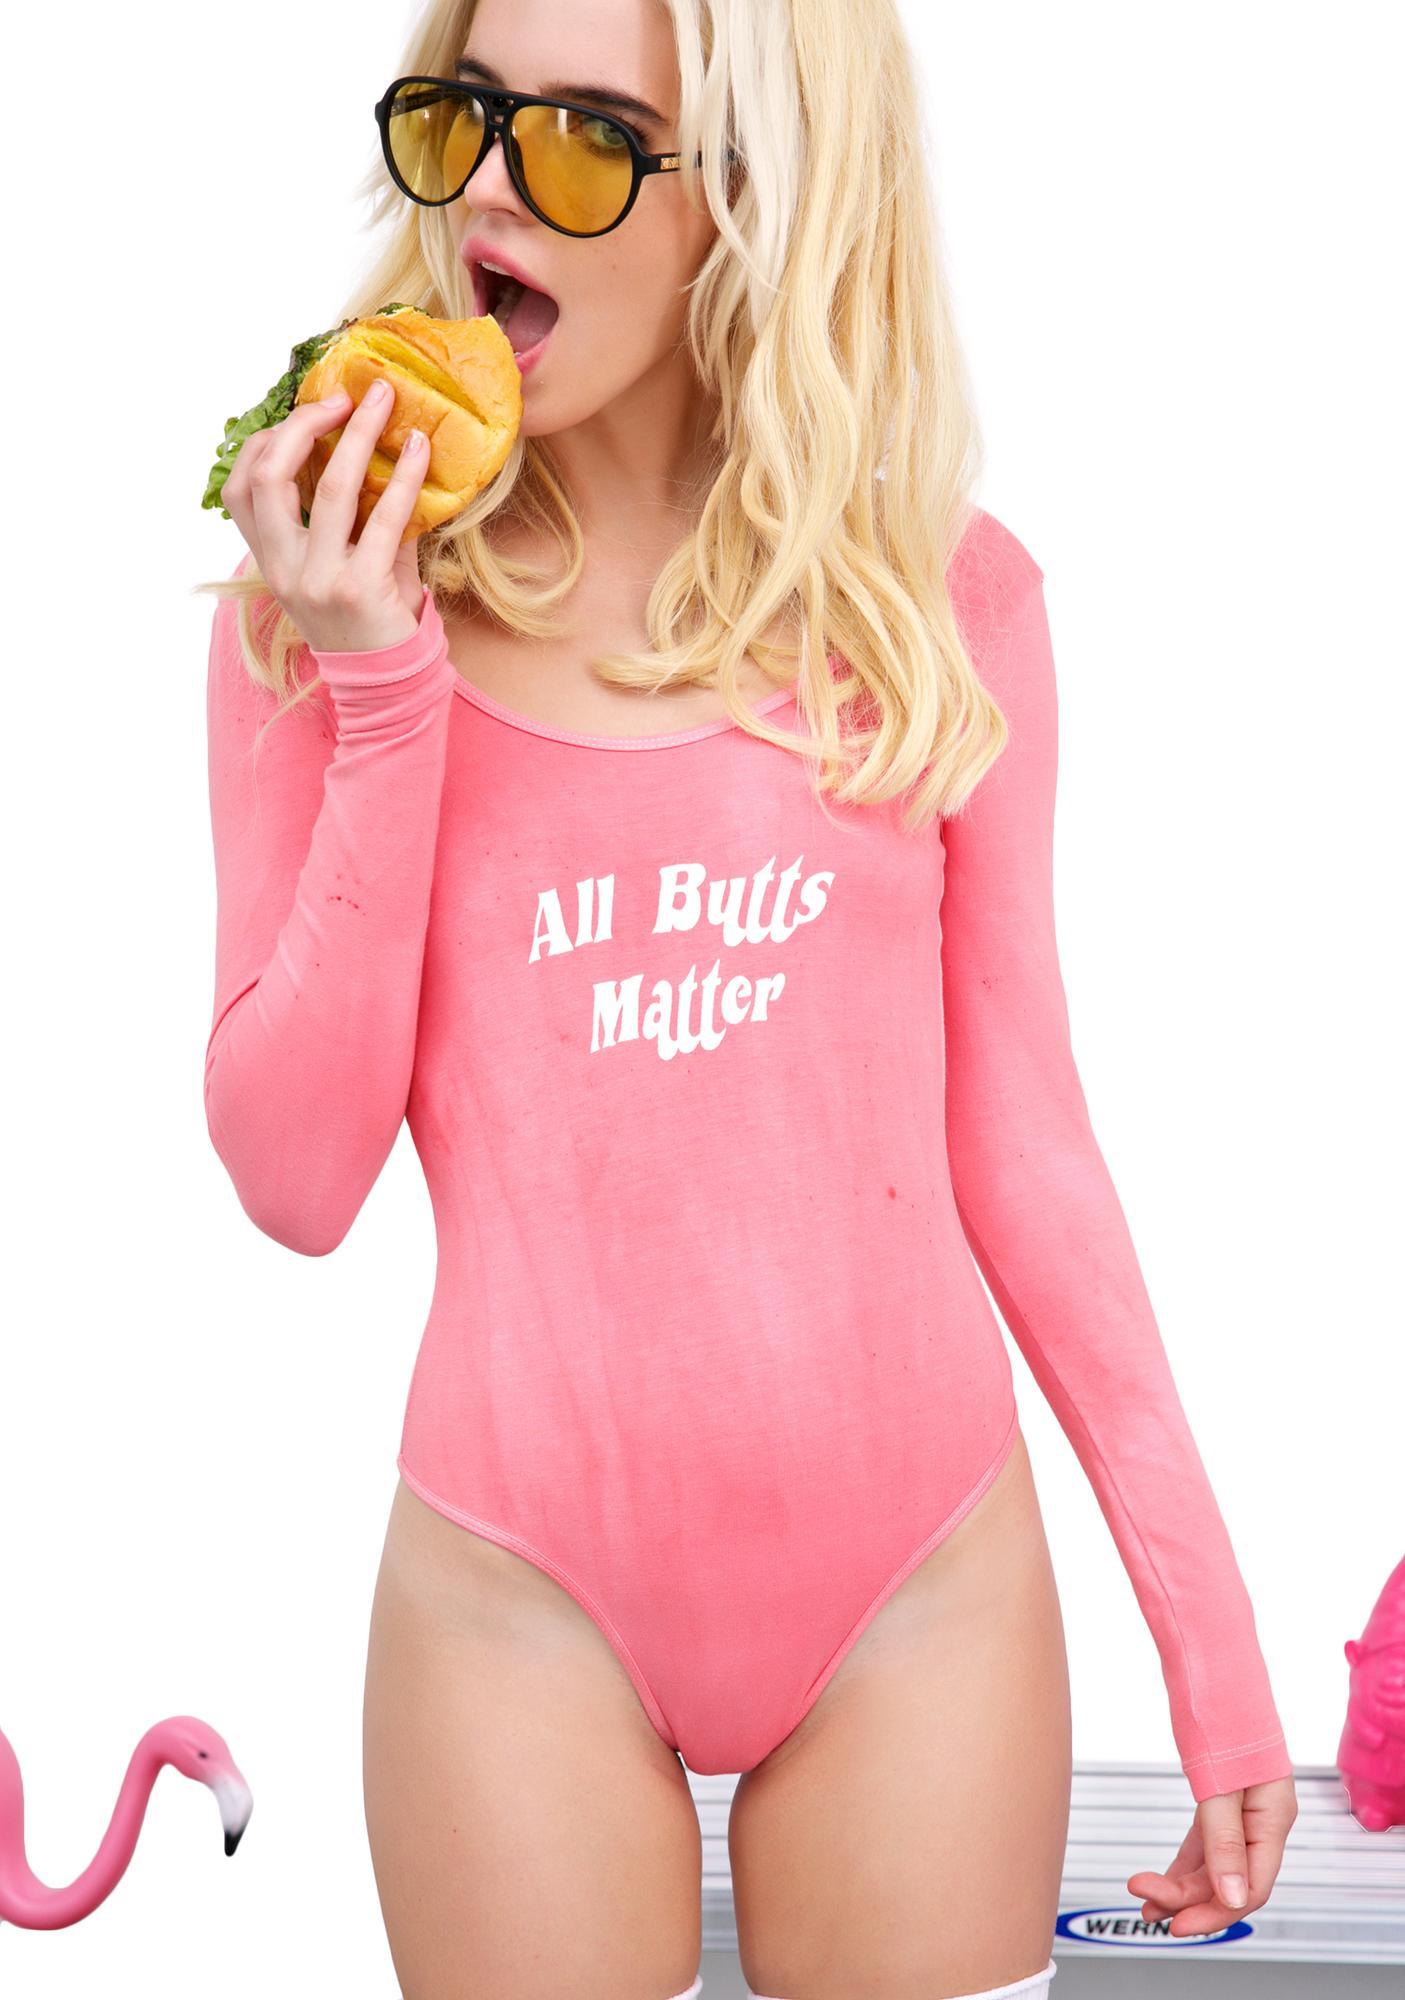 Burger And Friends All Butts Matter Bodysuit